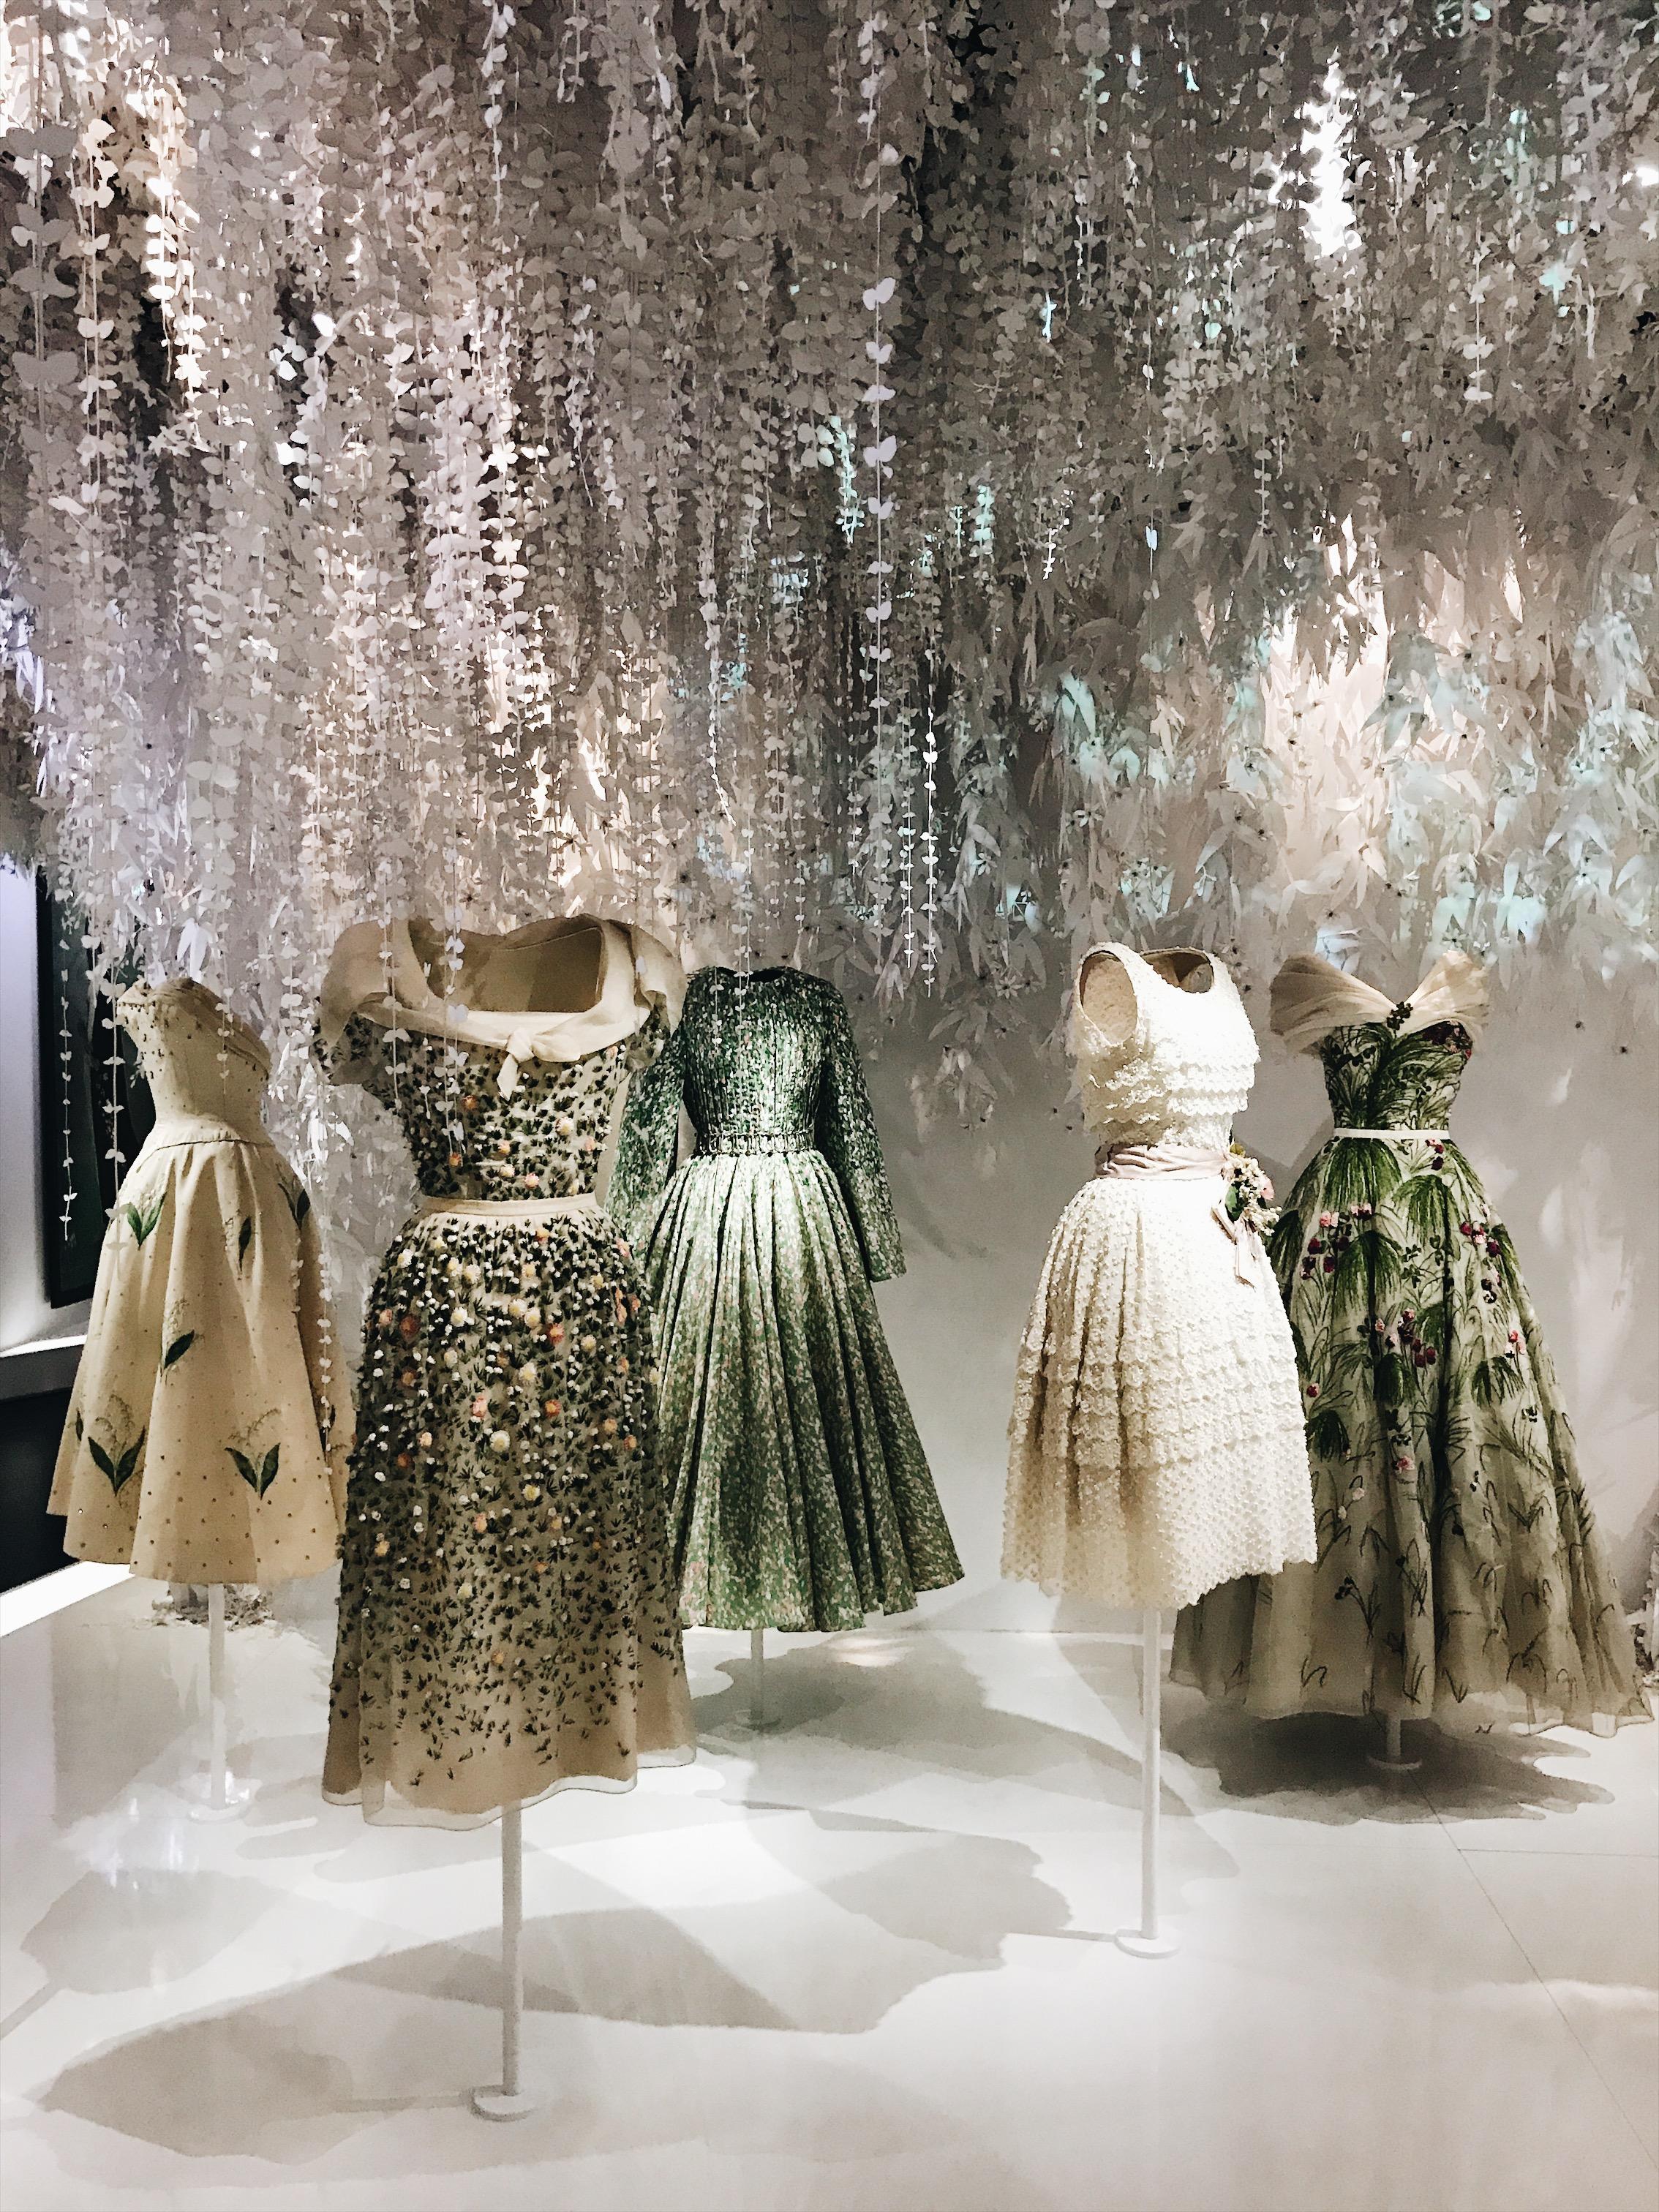 The Dior Gardens, a highlight of the exhibition